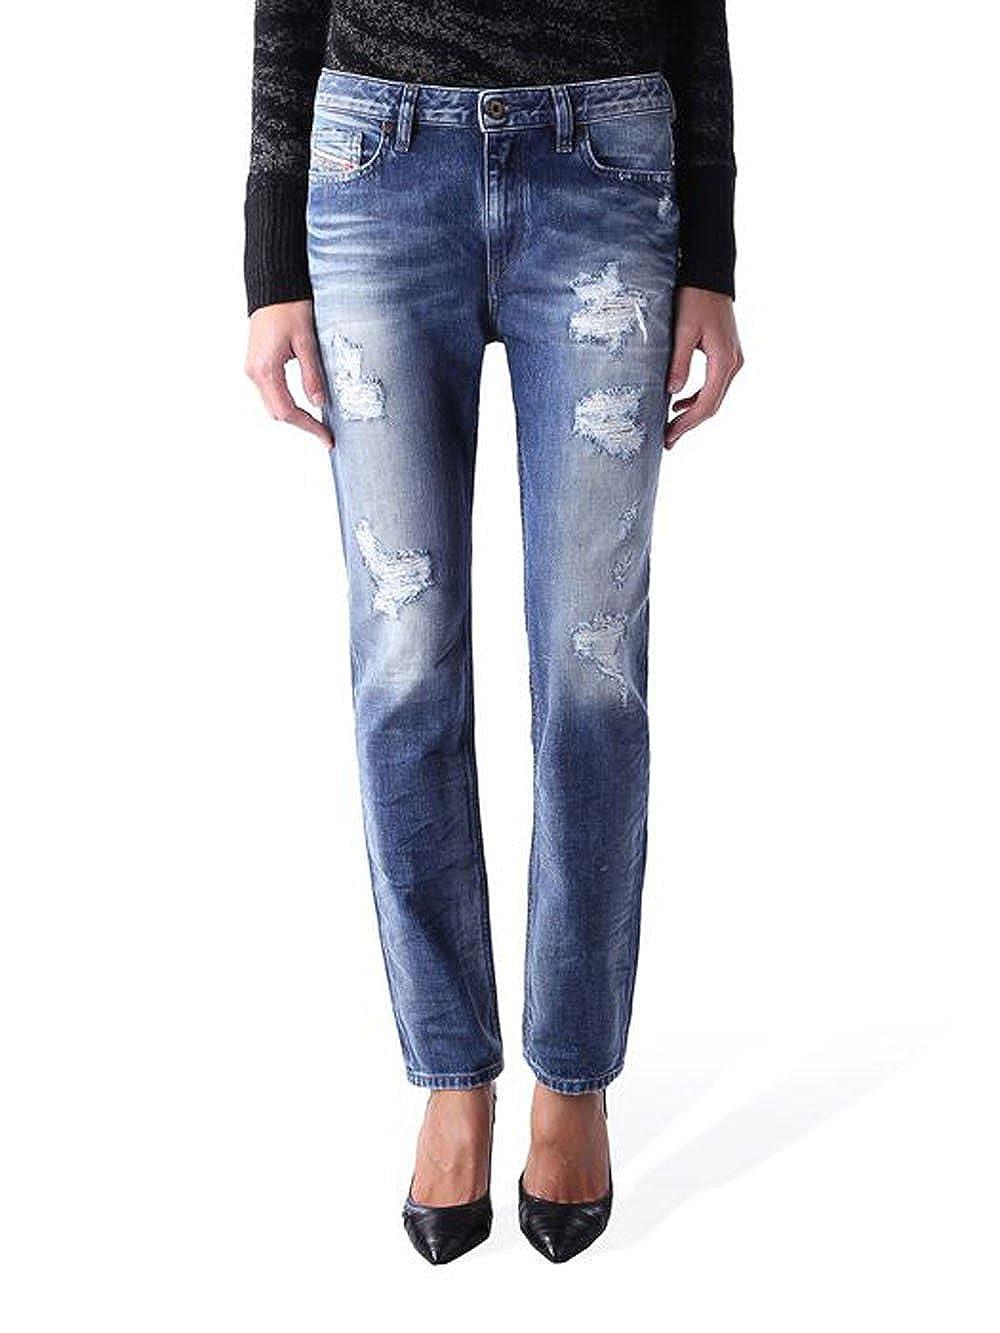 TALLA W23 / L32. Diesel - Jeans/Vaquero para Mujer Rizzo 848I - Regular Slim Straight